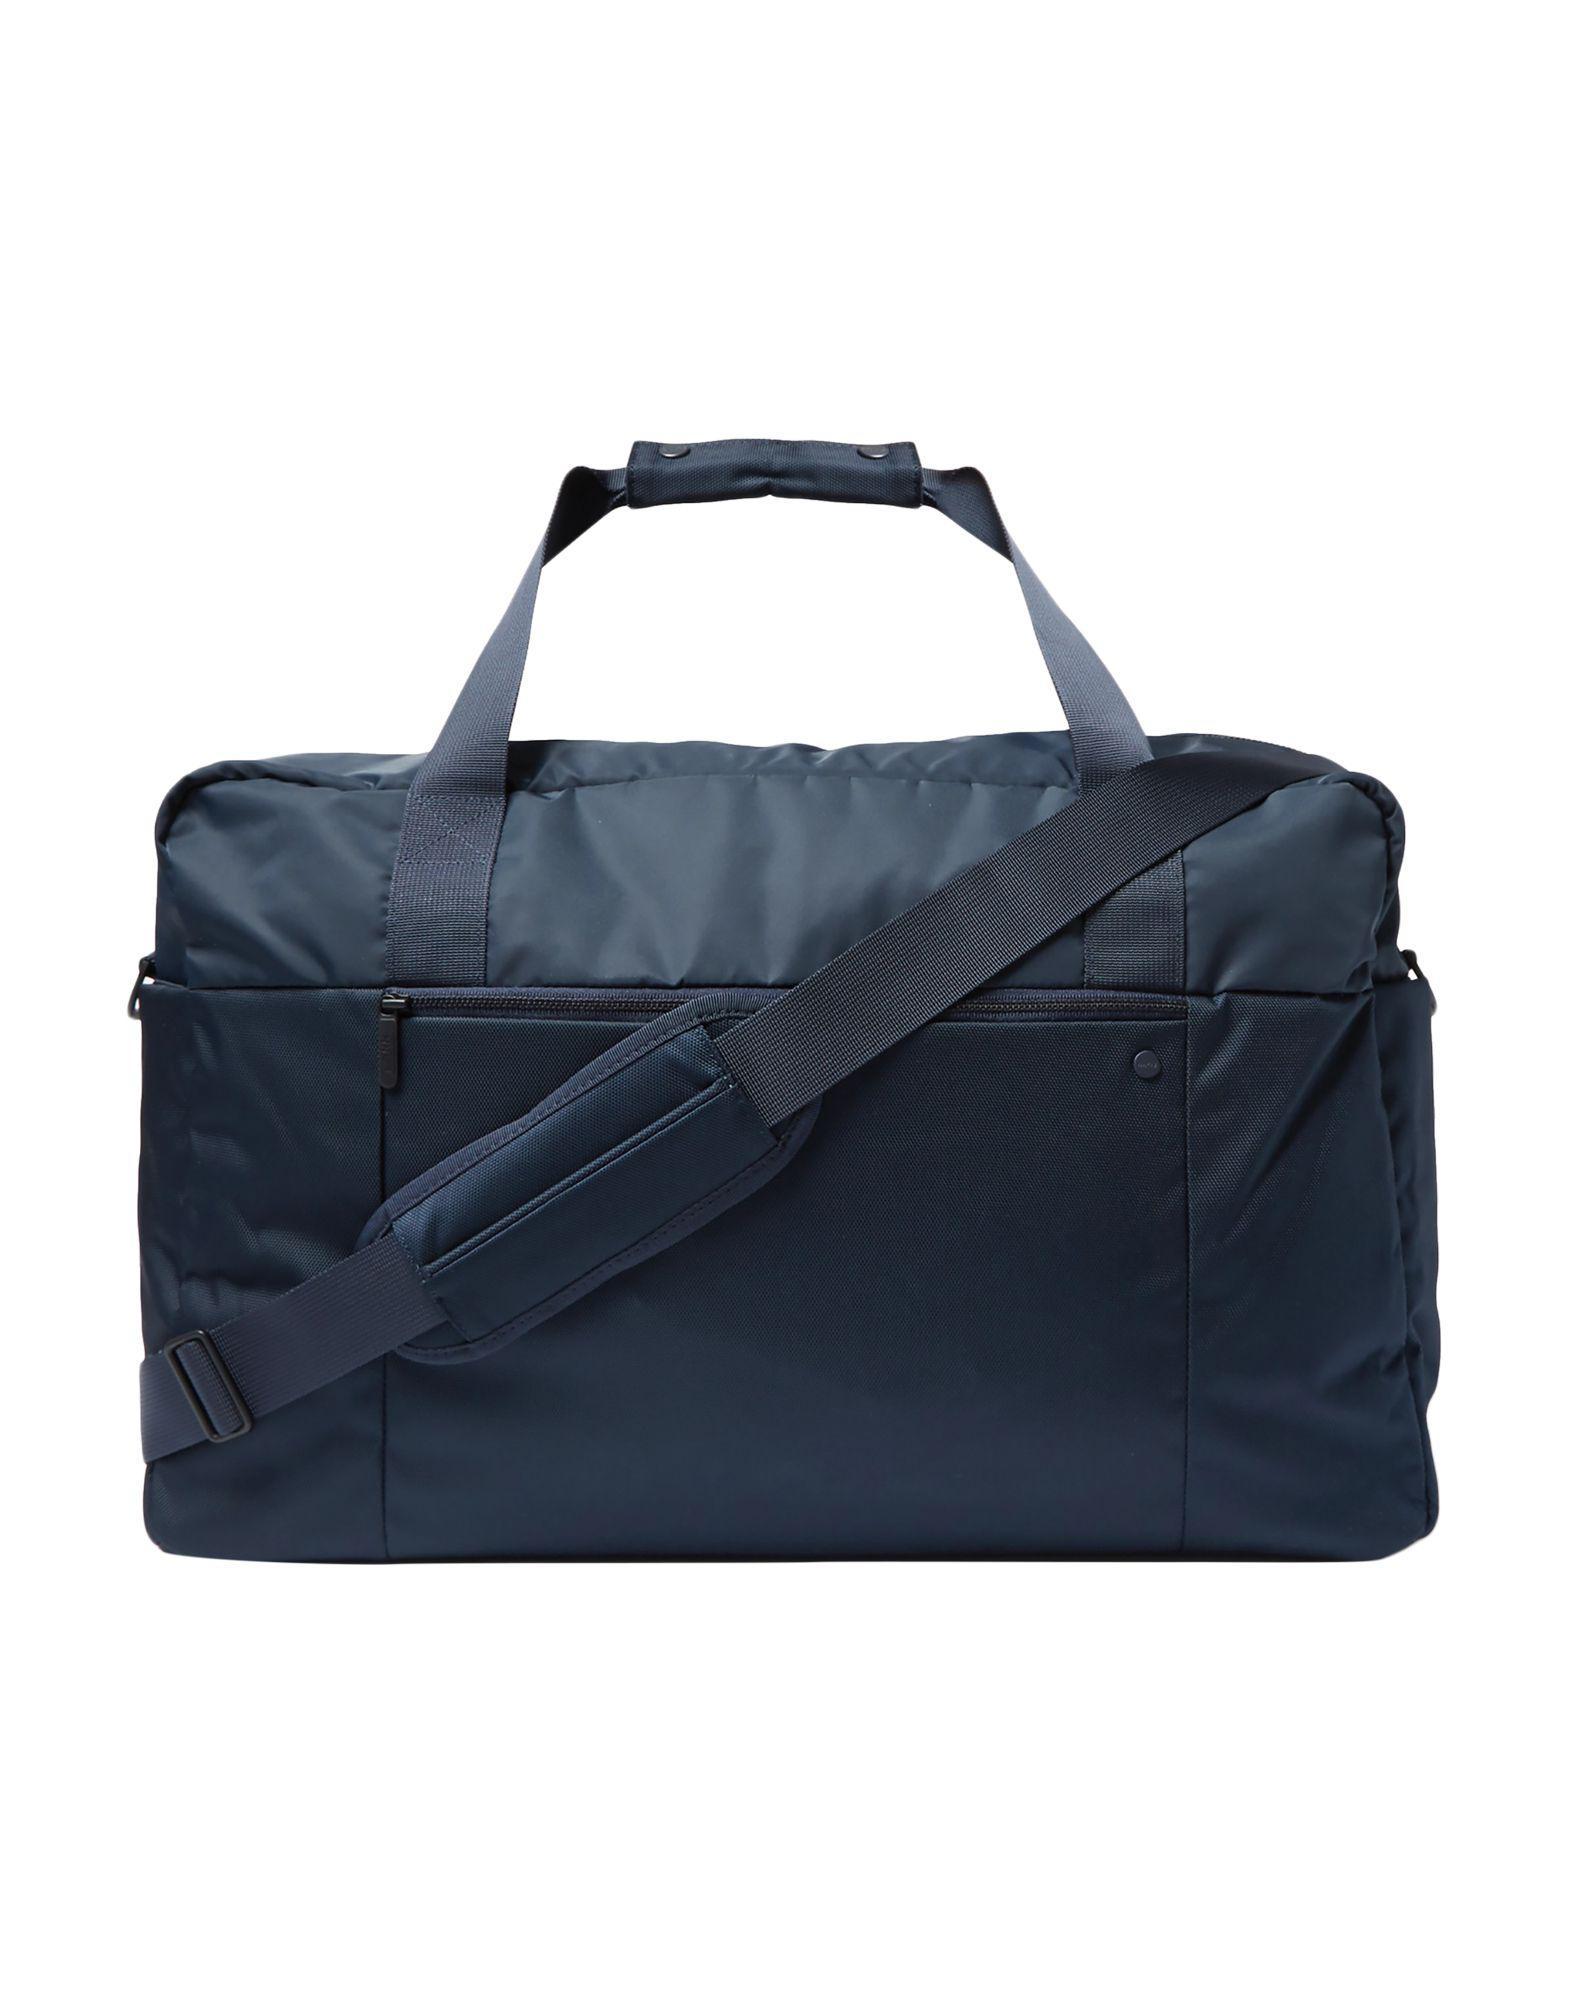 926a848cc7 Nn07 Travel   Duffel Bags in Blue for Men - Lyst